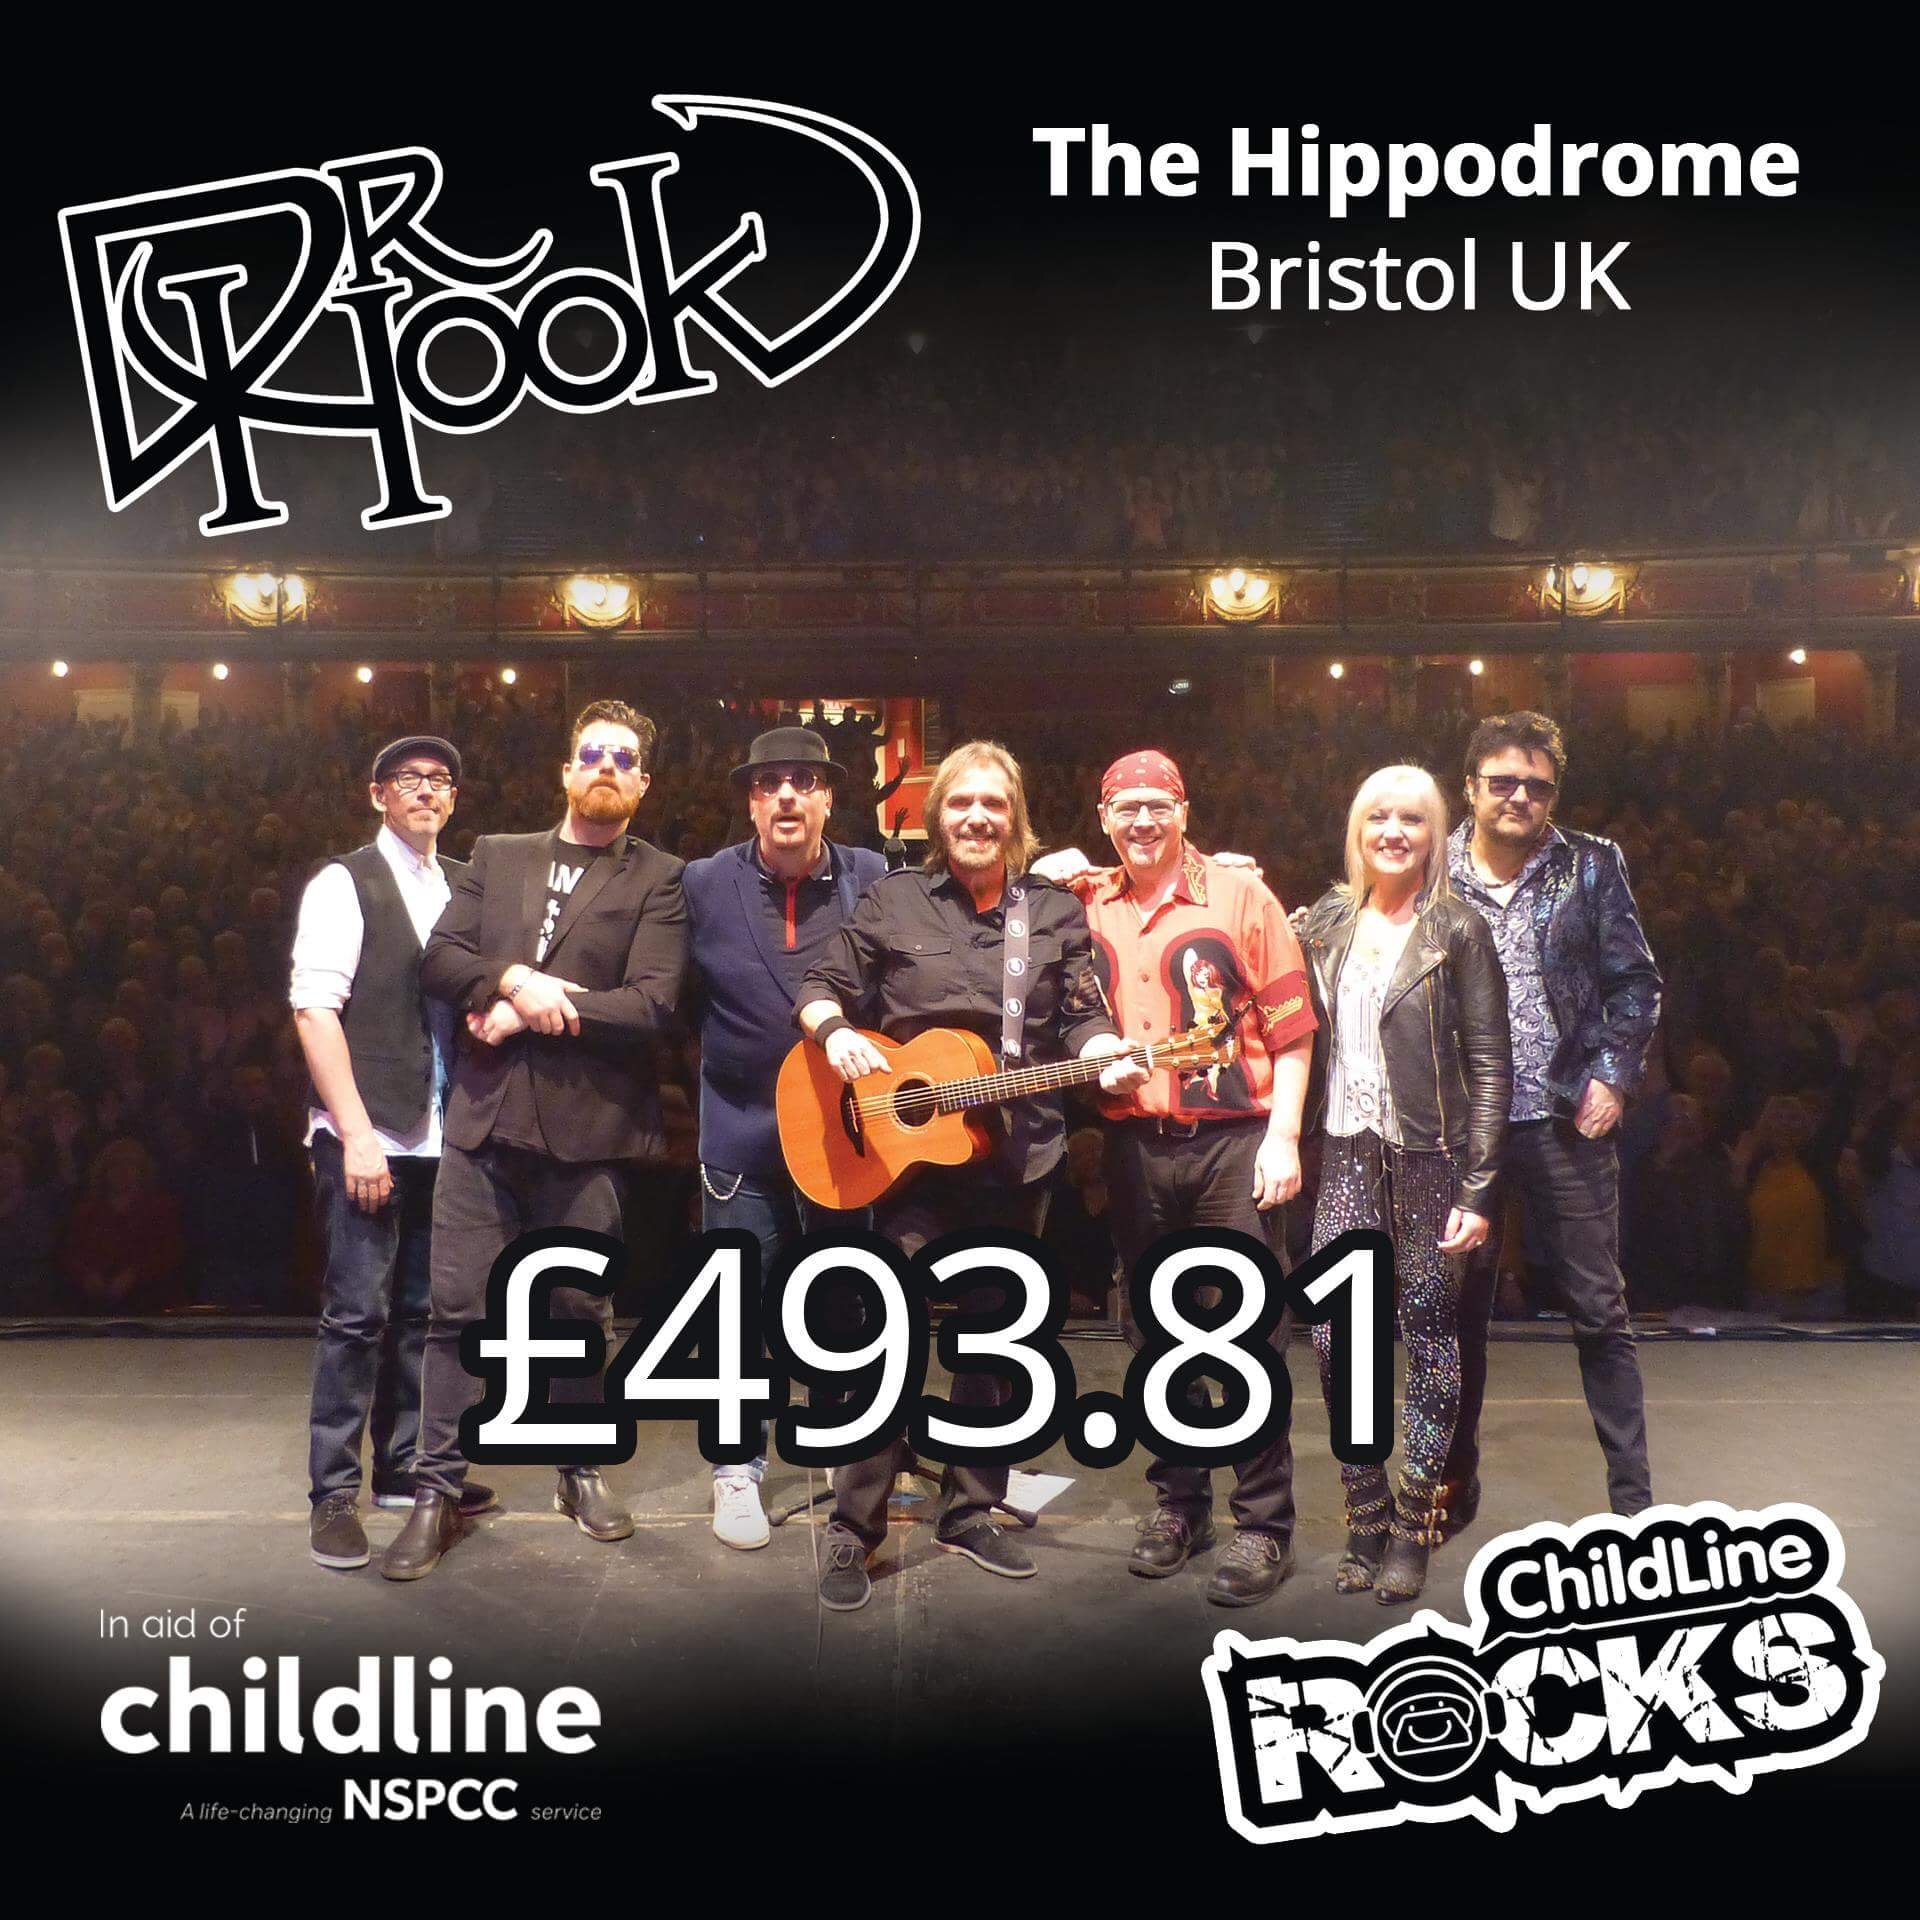 Dr-Hook-Fundraising-NSPCC-Childline-Bristol